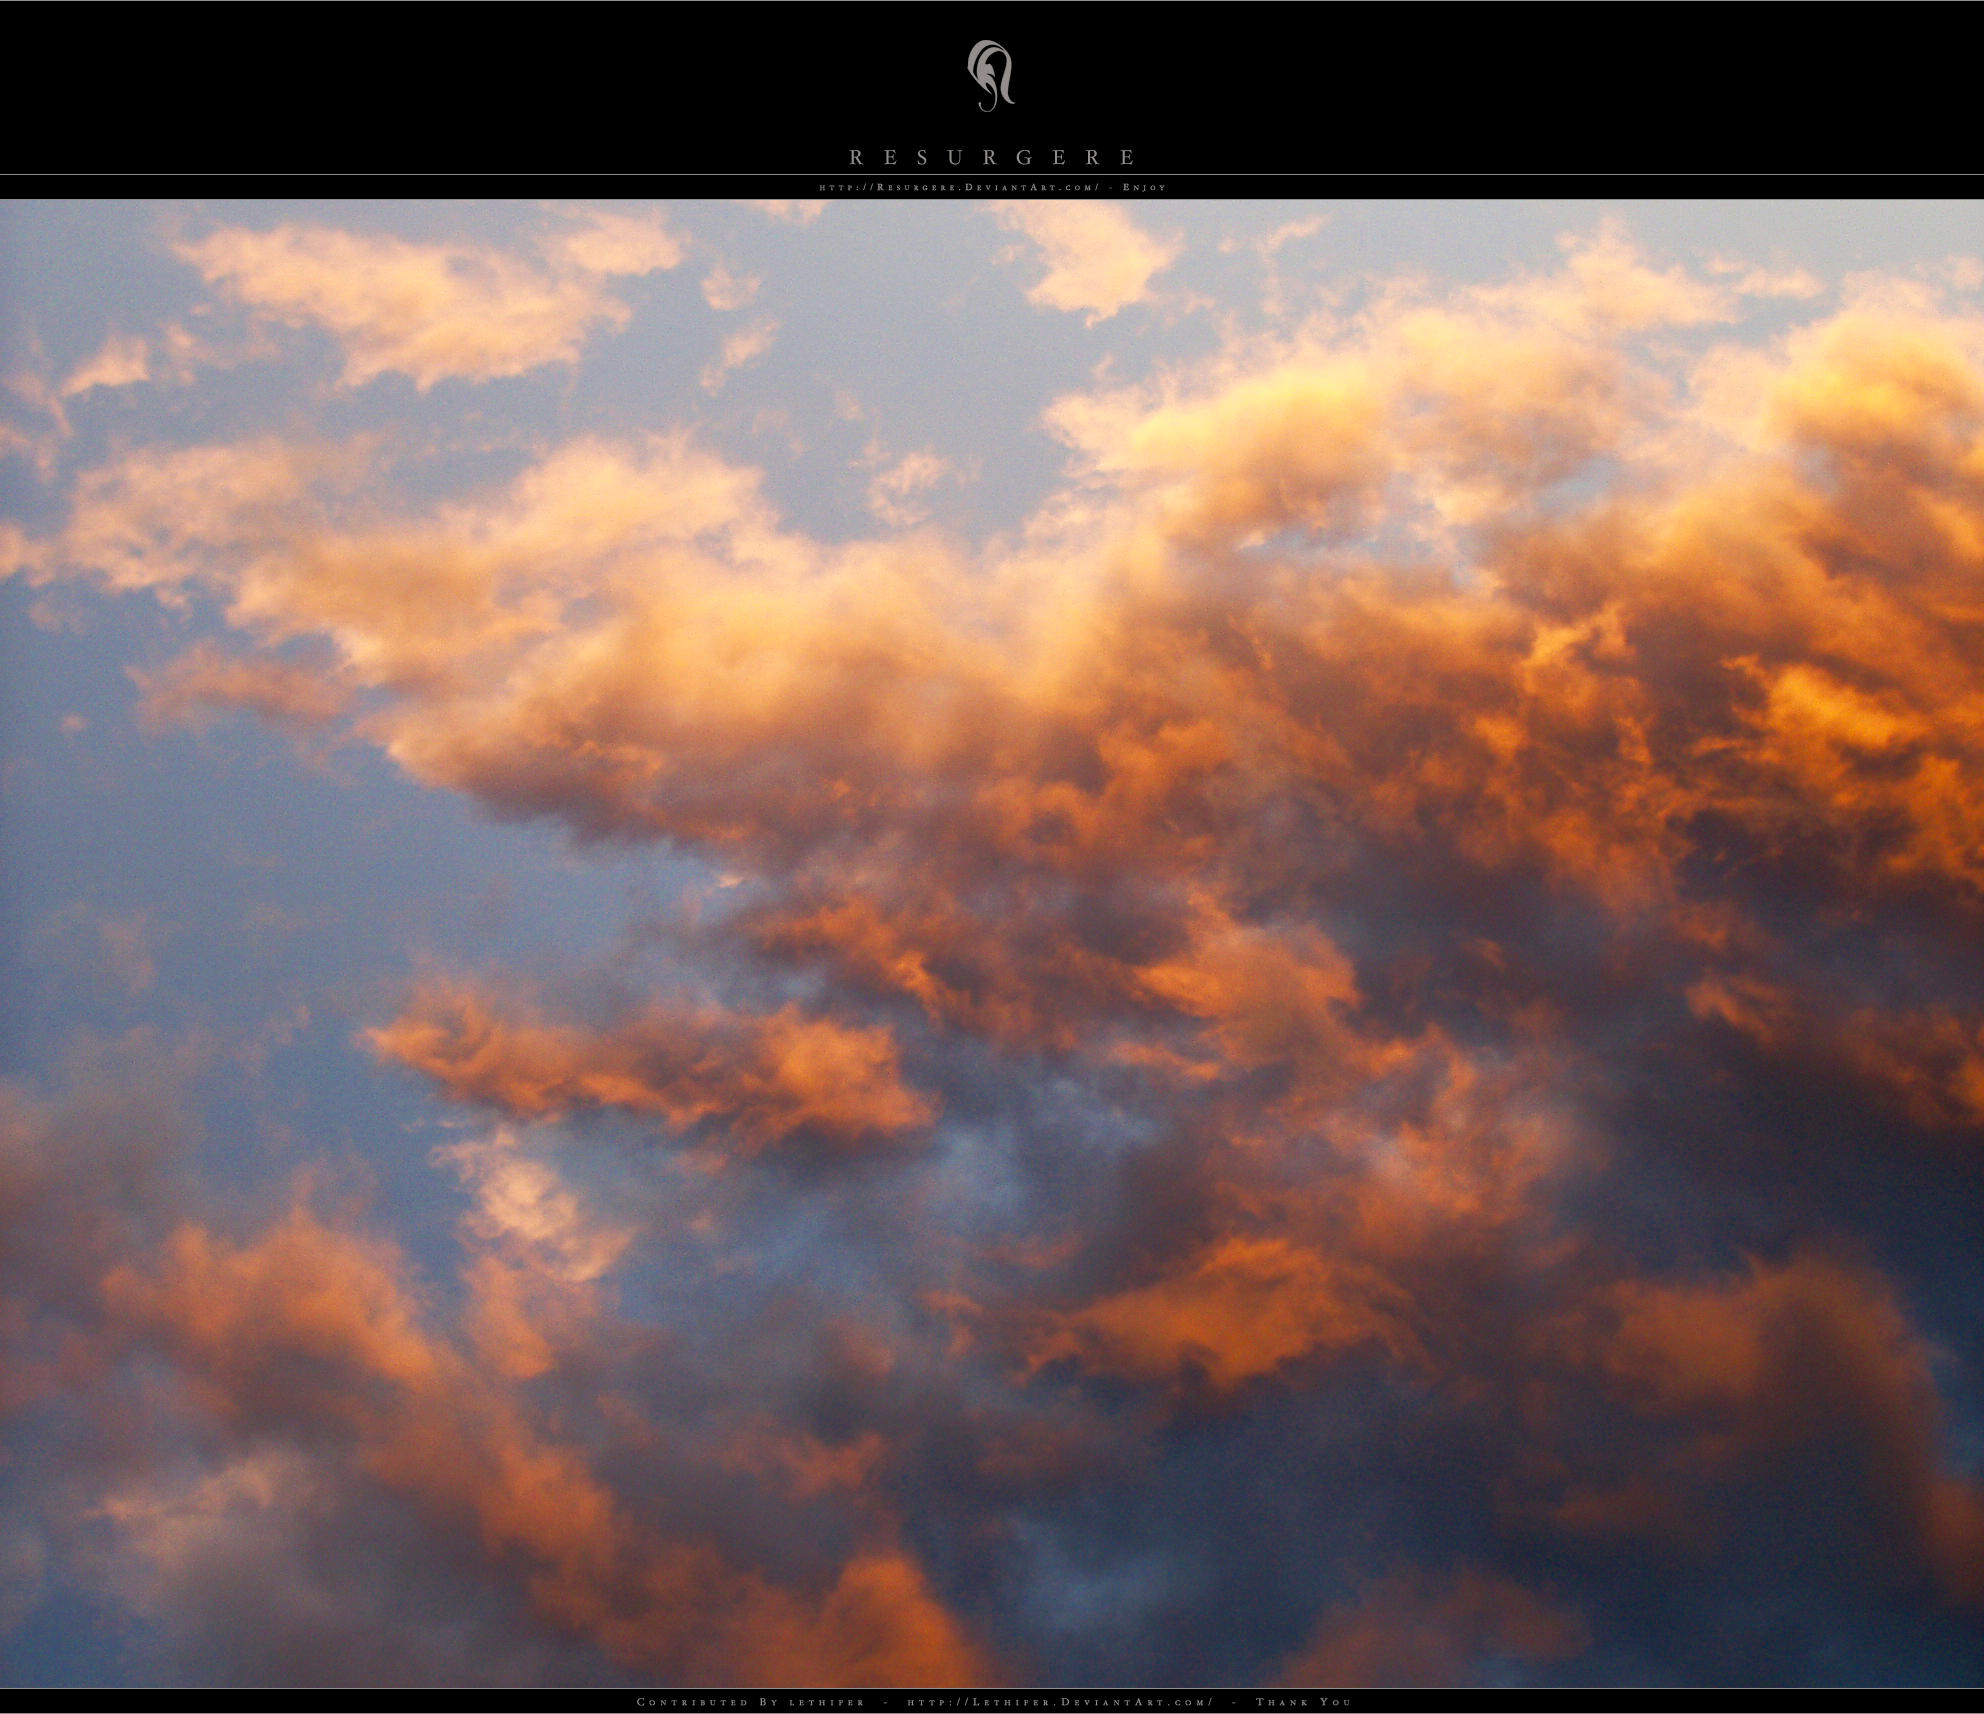 Photo - Sky - 6090 by resurgere